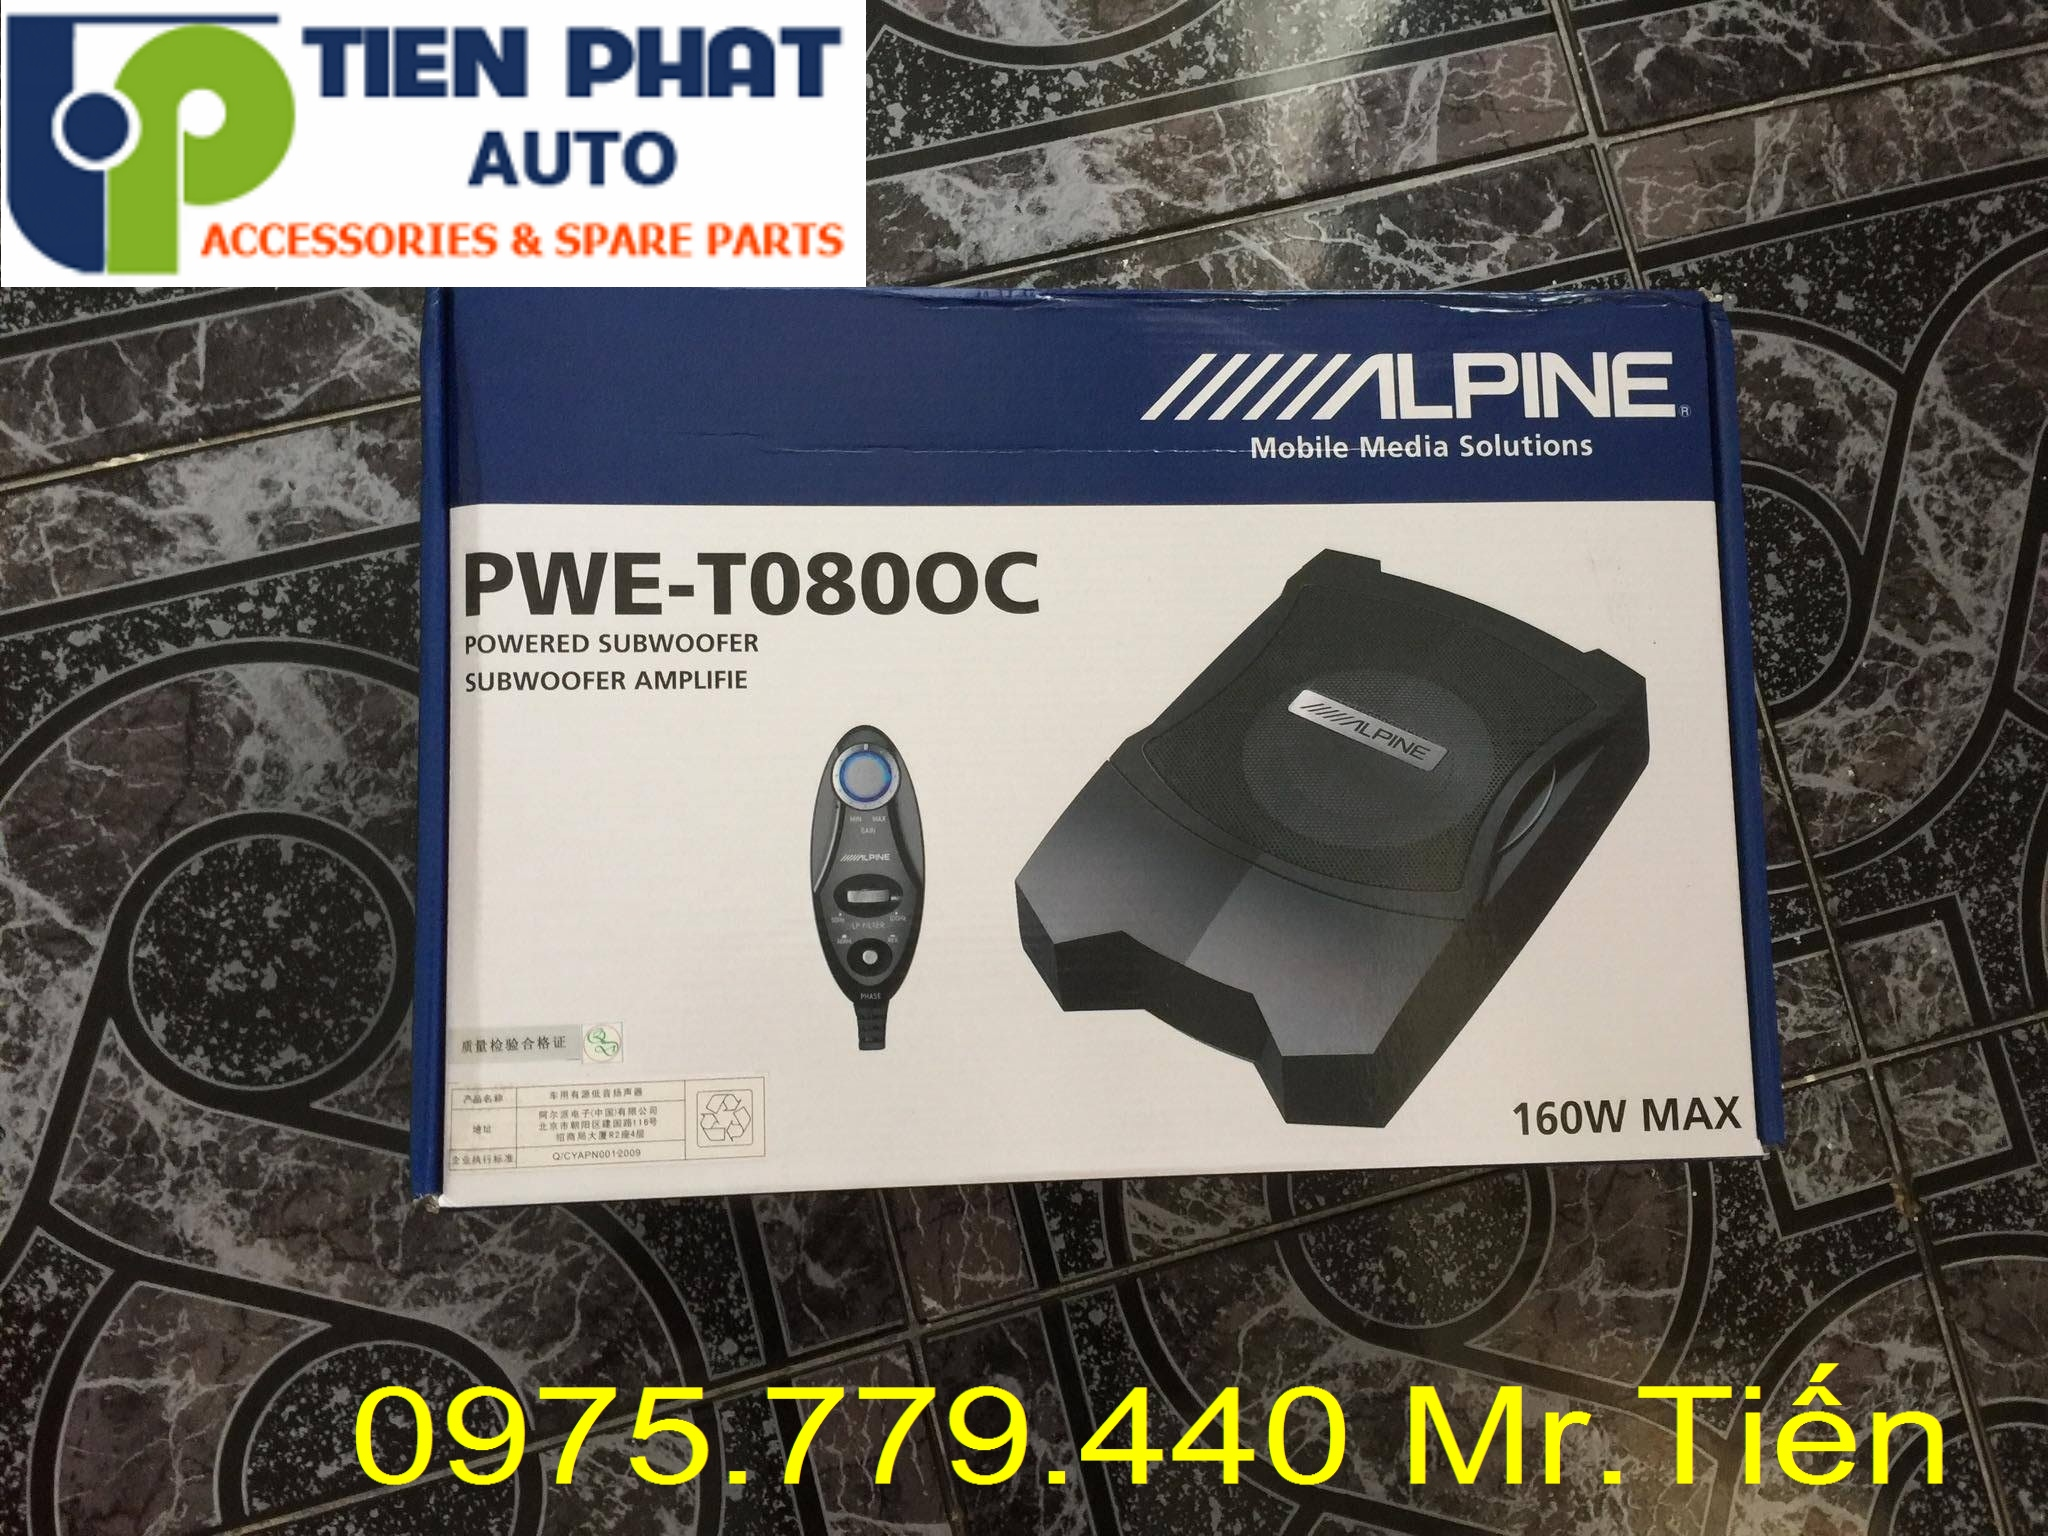 Lắp Loa sub Alpine PWE-T0800C cho Chevrolet Captiva Lắp Đặt Tận Nơi